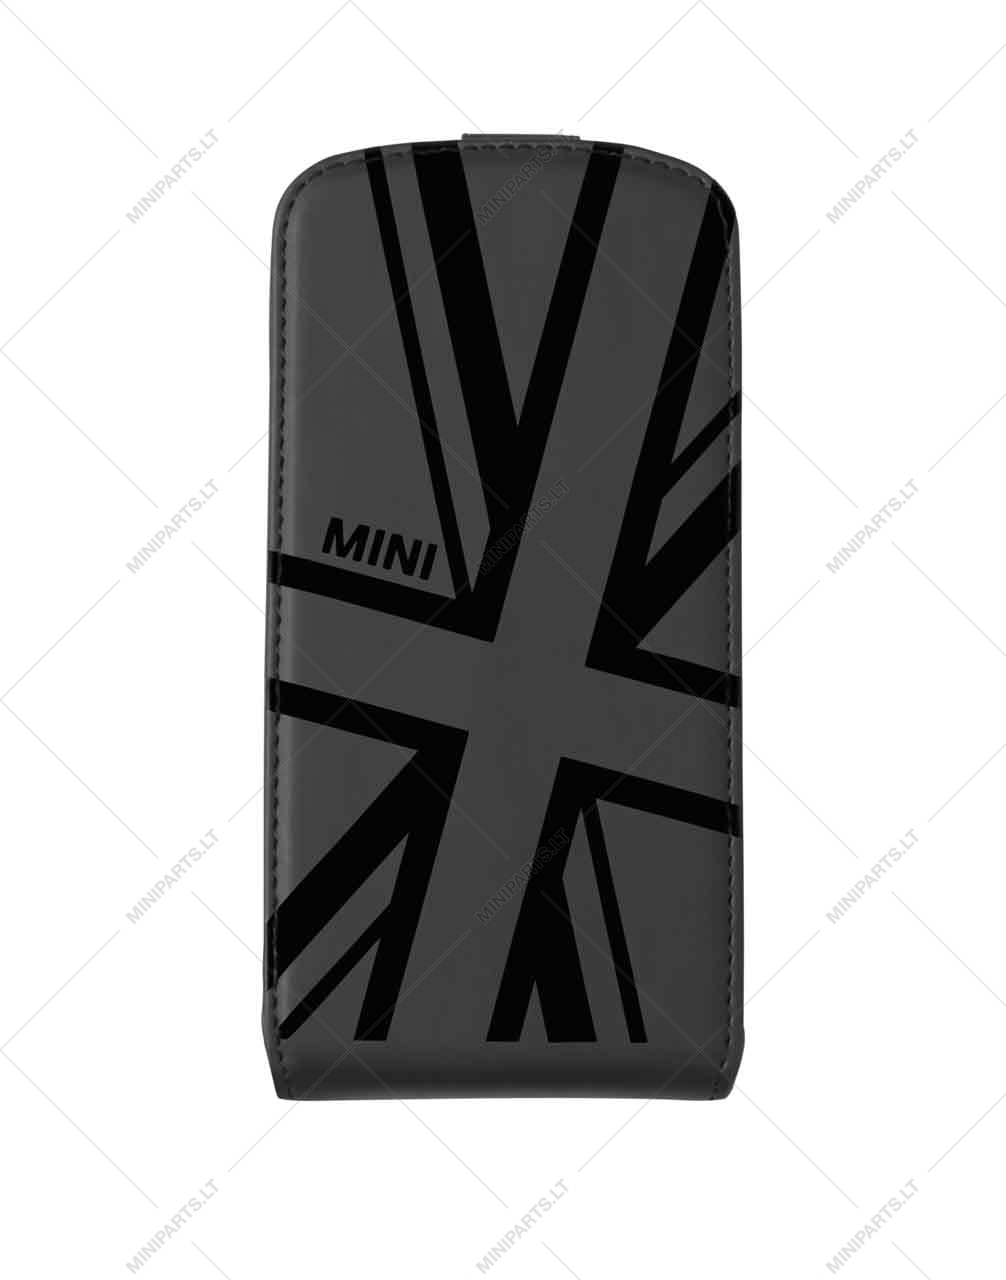 Mini Black Jack Phone Flap Case Samsung Galaxy S3 80282350537